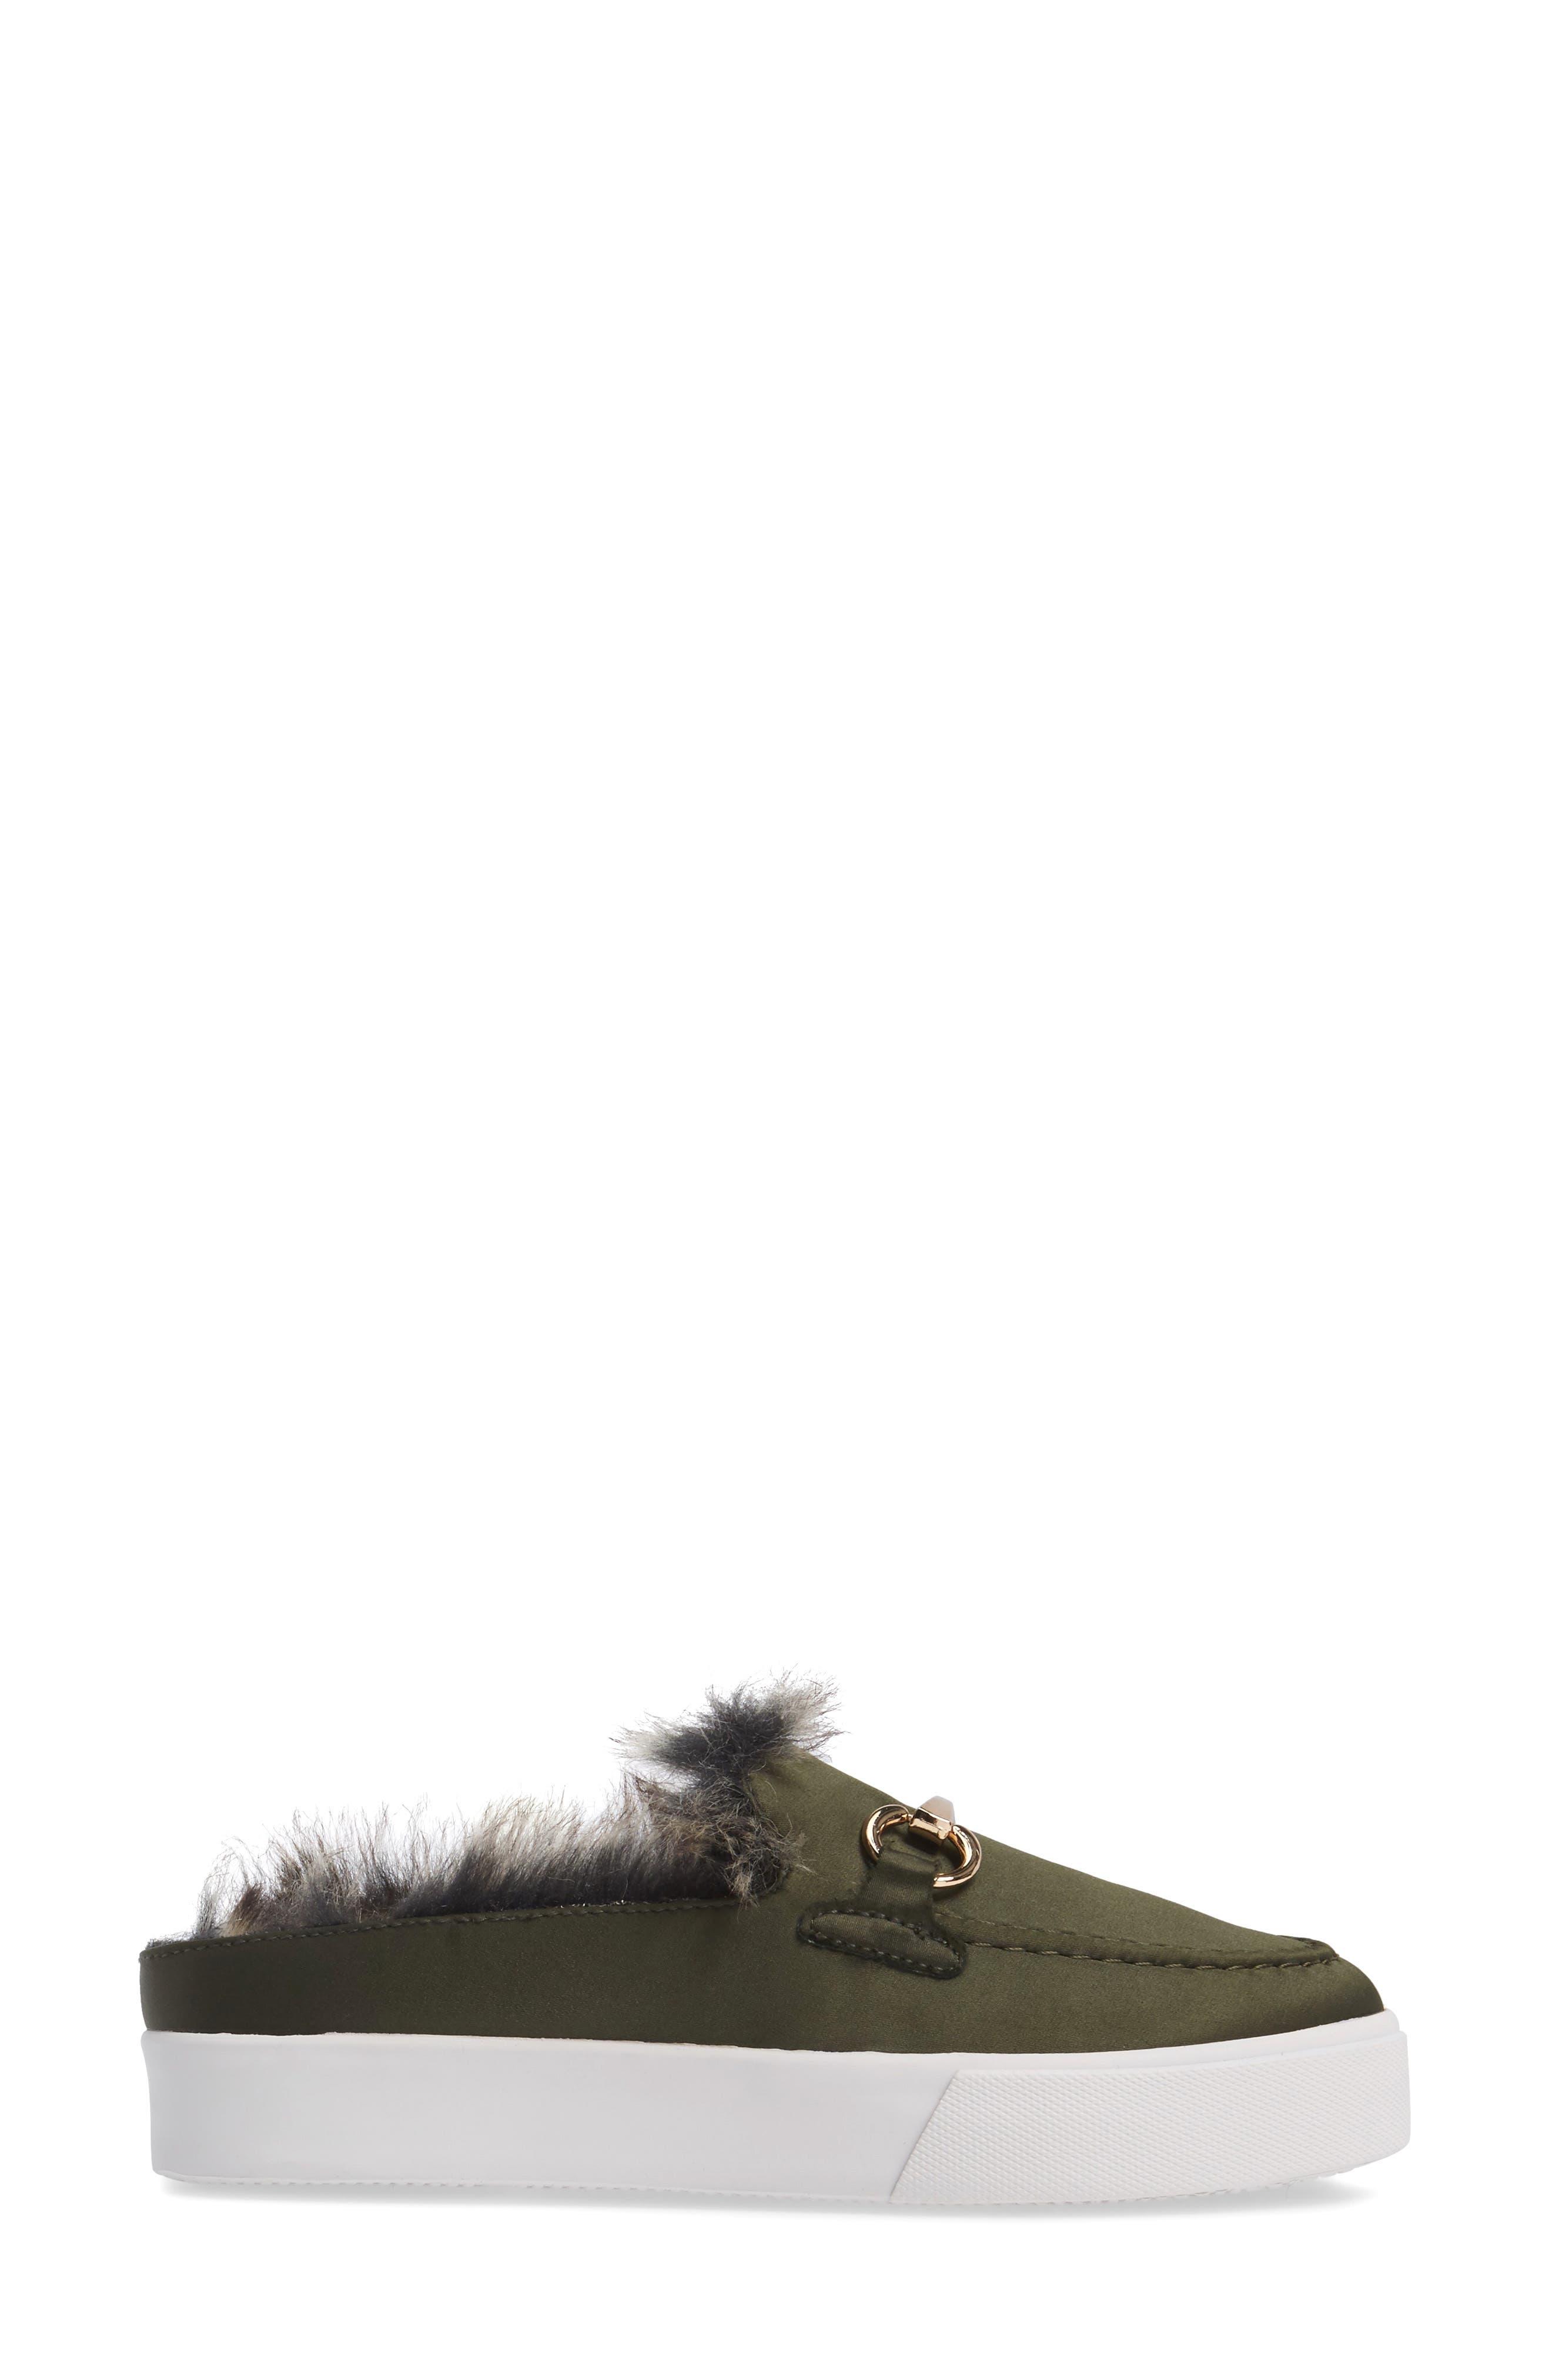 Tico Faux Fur Sneaker Mule,                             Alternate thumbnail 3, color,                             Olive Satin-Gold-Grey